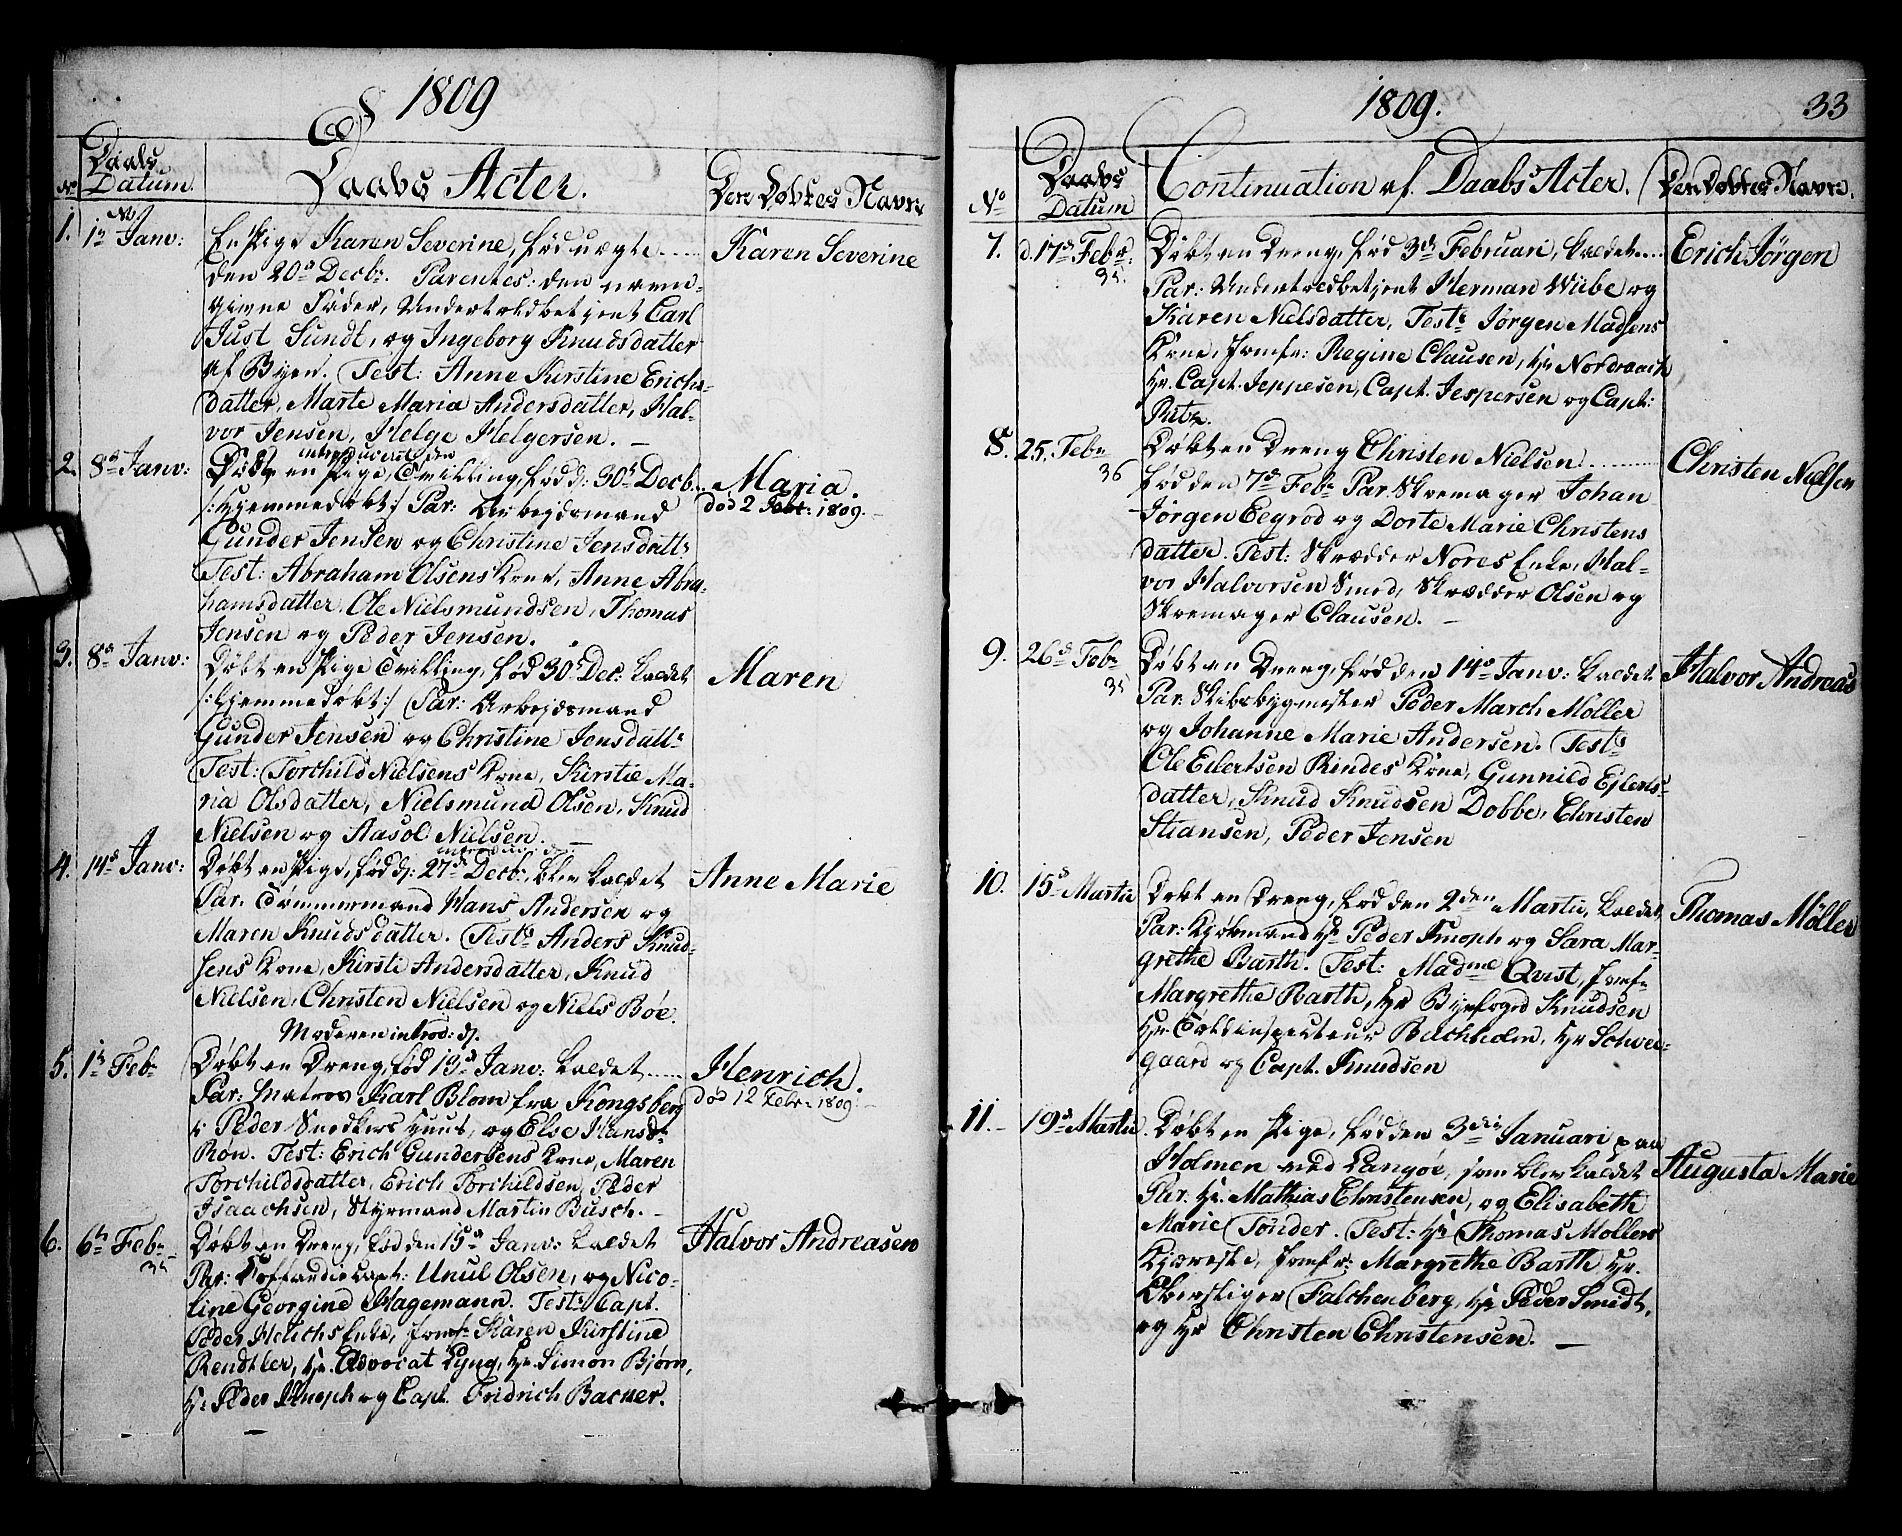 SAKO, Kragerø kirkebøker, F/Fa/L0003: Ministerialbok nr. 3, 1802-1813, s. 33